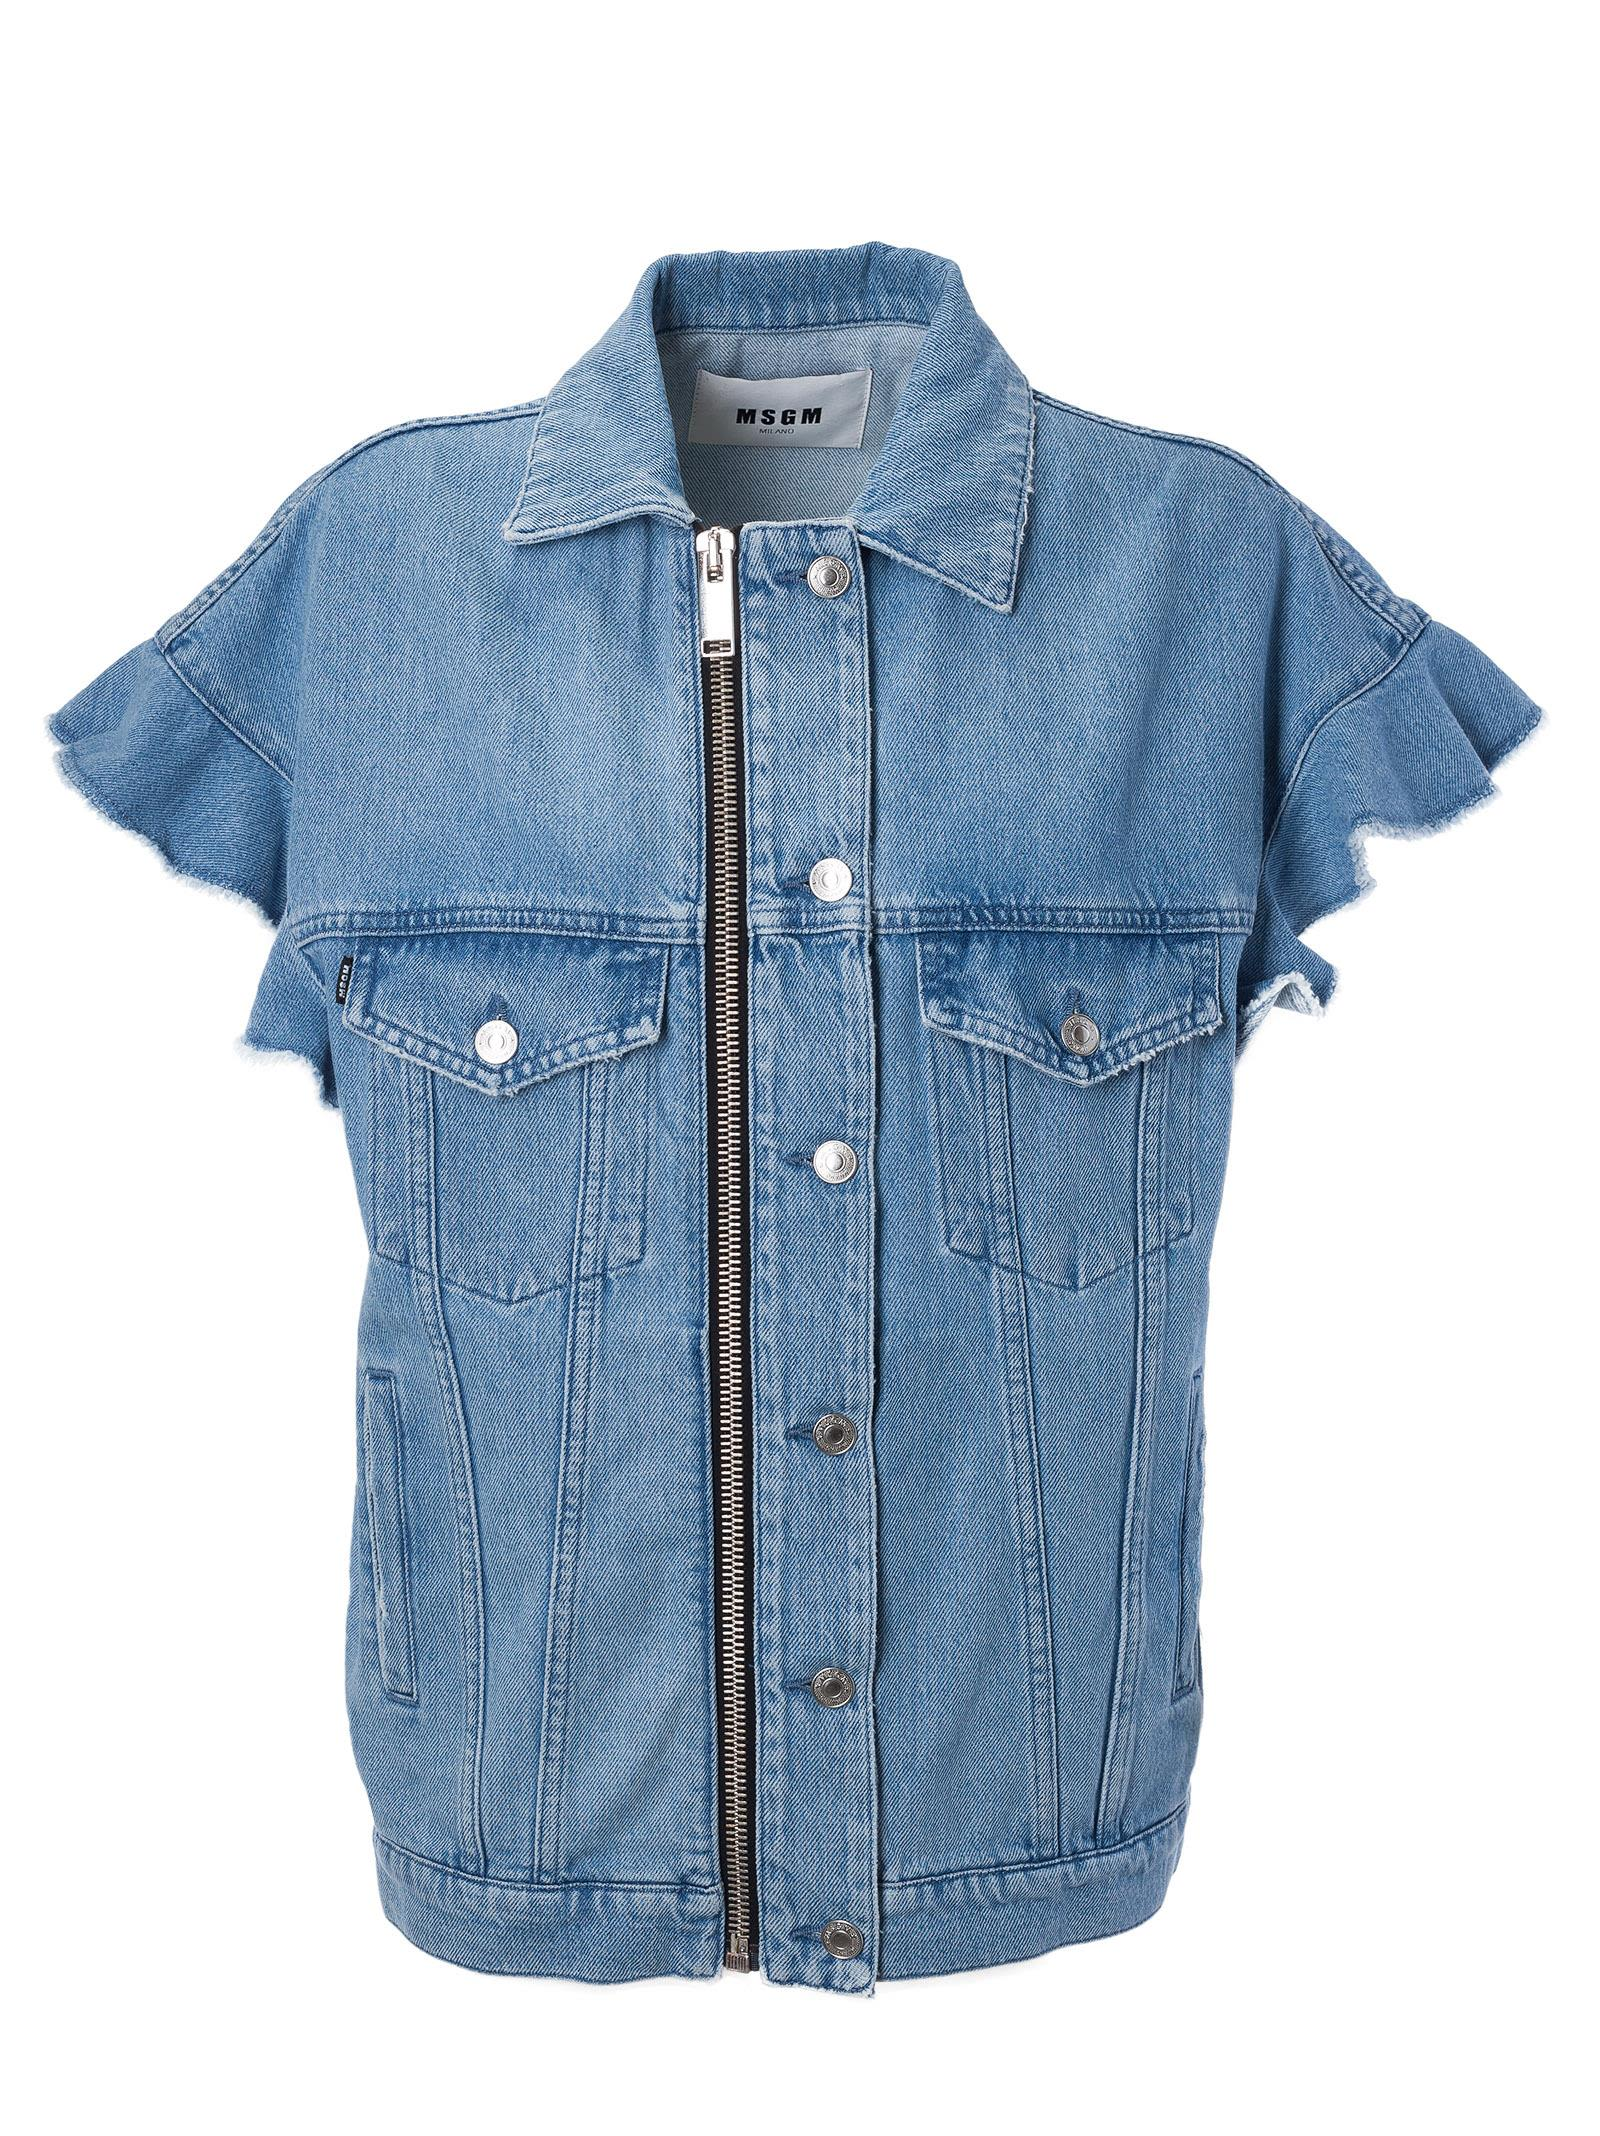 Msgm Ruffle Sleeve Denim Shirt